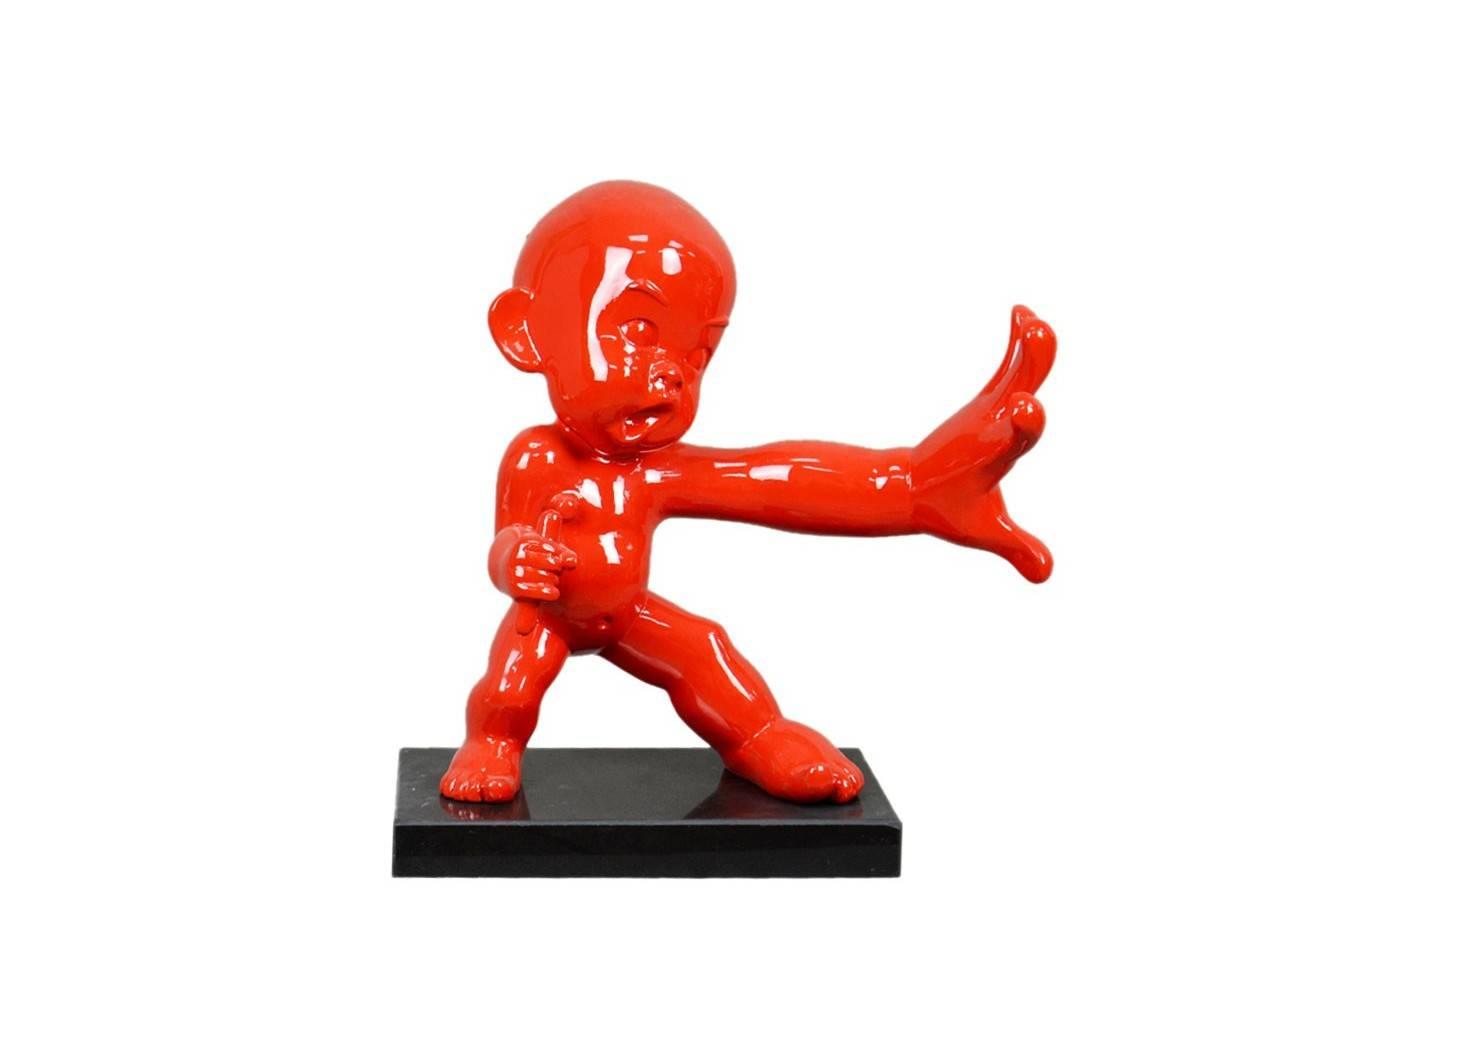 Baby ninja doing kung-fu training